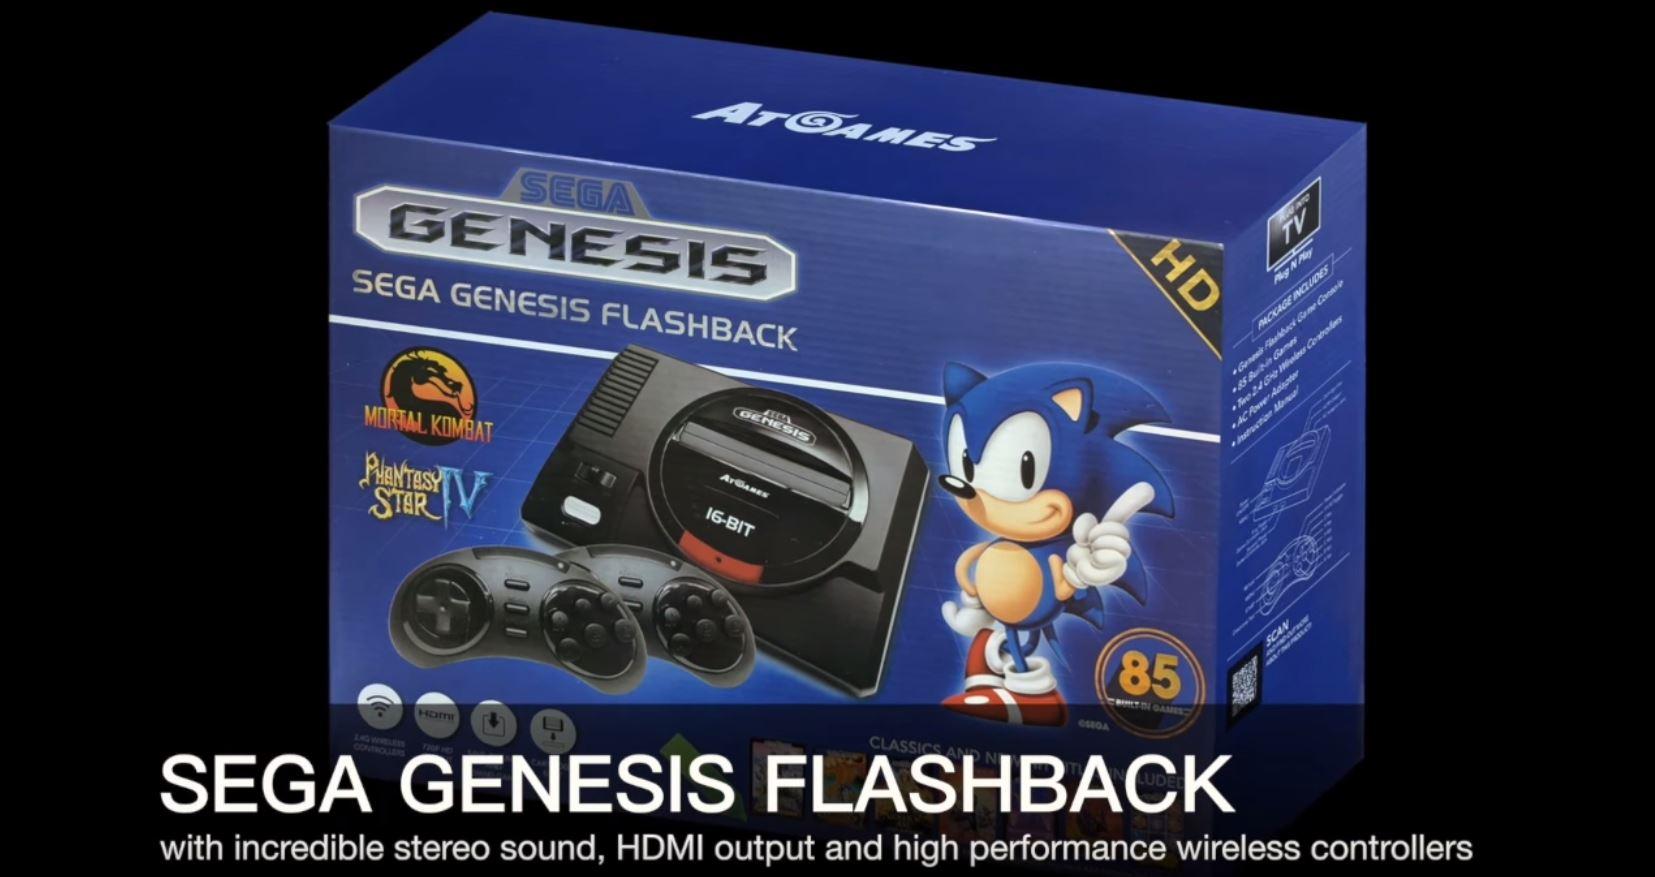 Sega Genesis Flashback: Die Retro-Konsole im Video